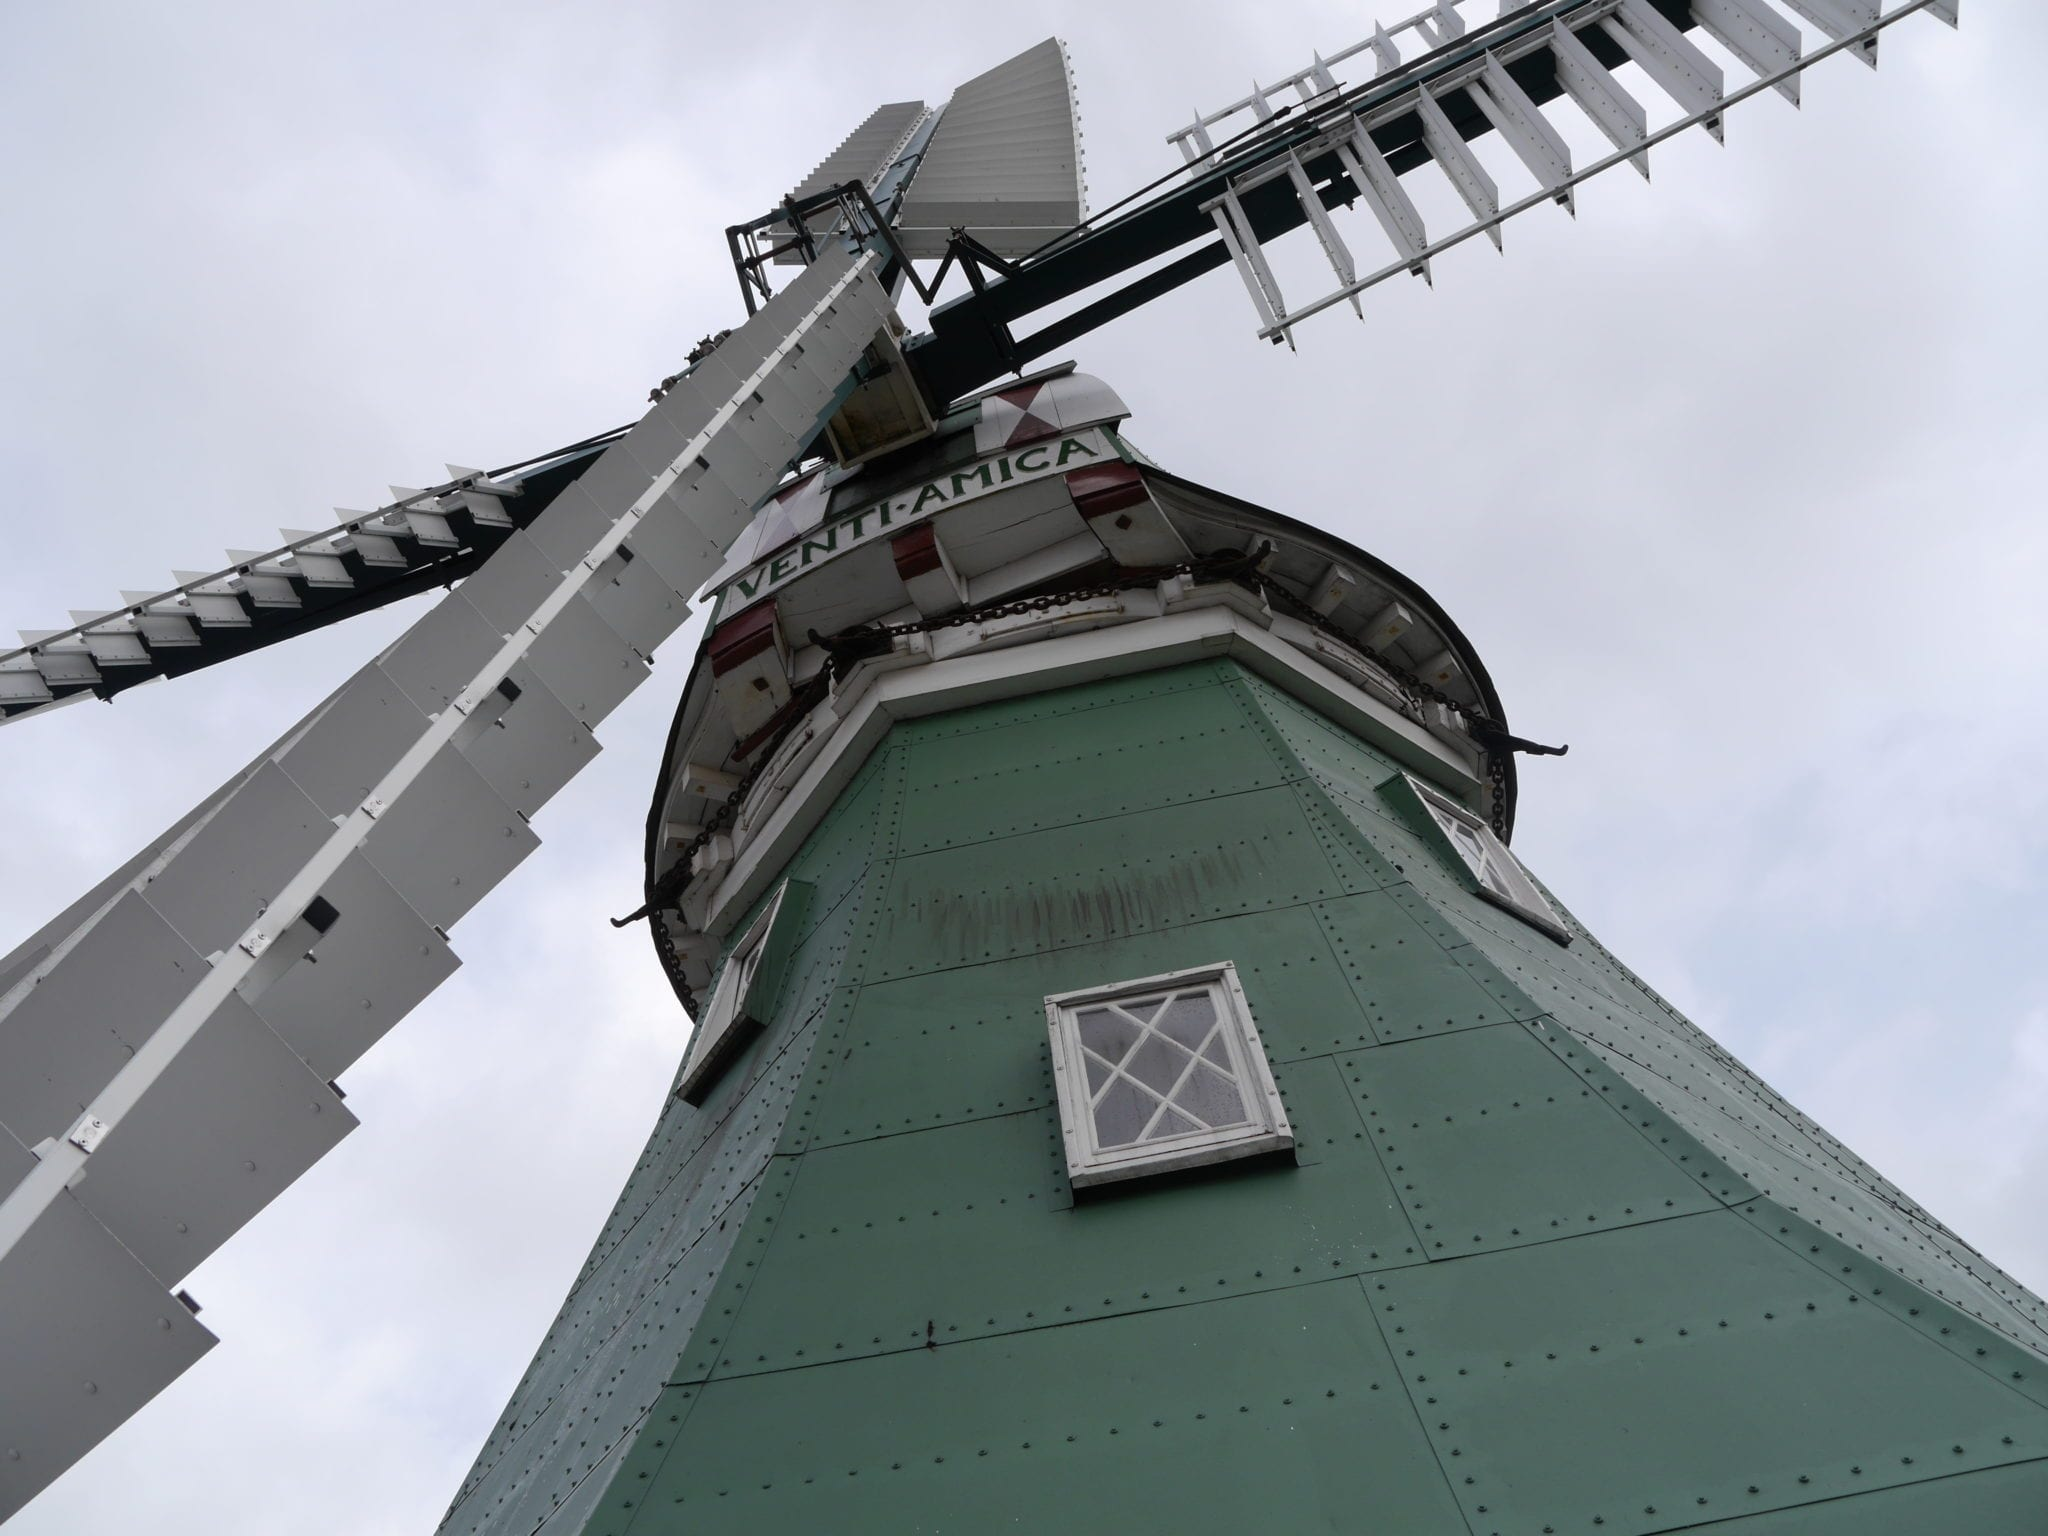 Venti Amica - Windmühle im Alten Land